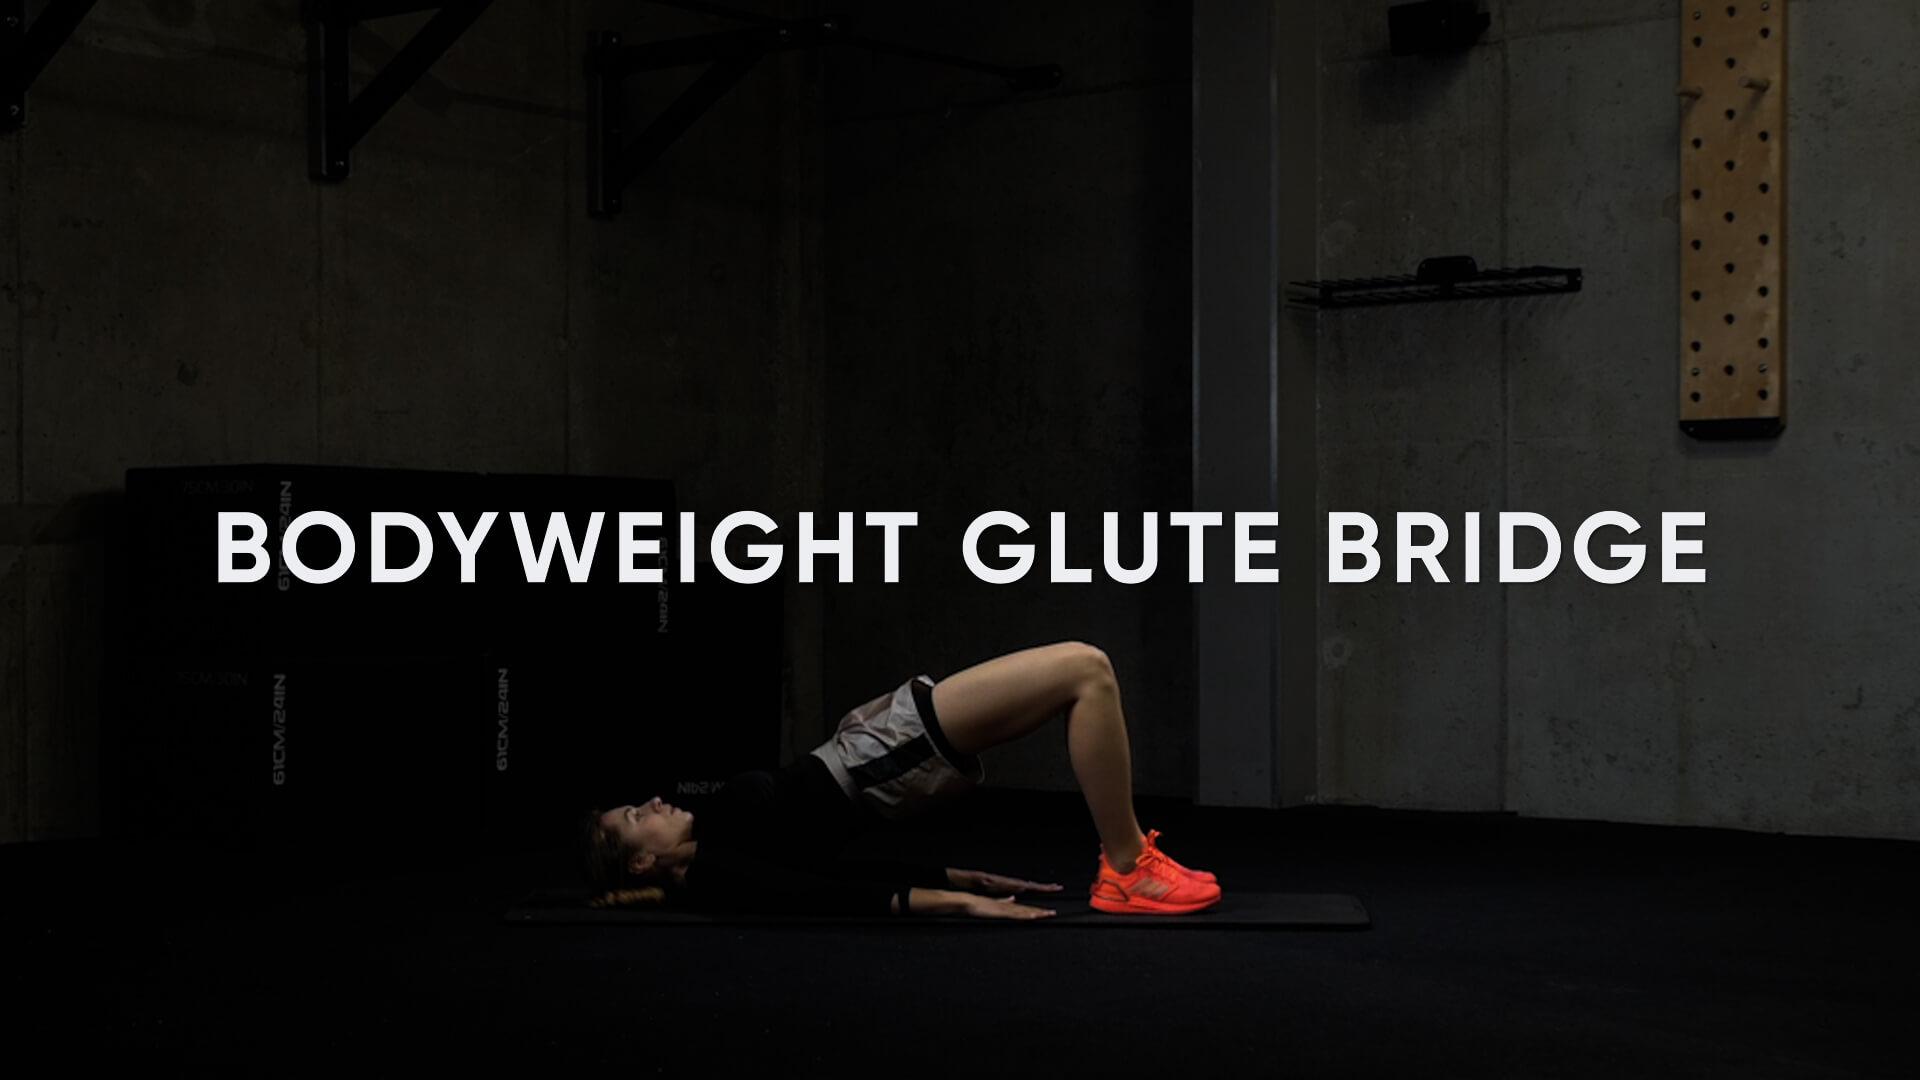 Bodyweight Glute Bridge